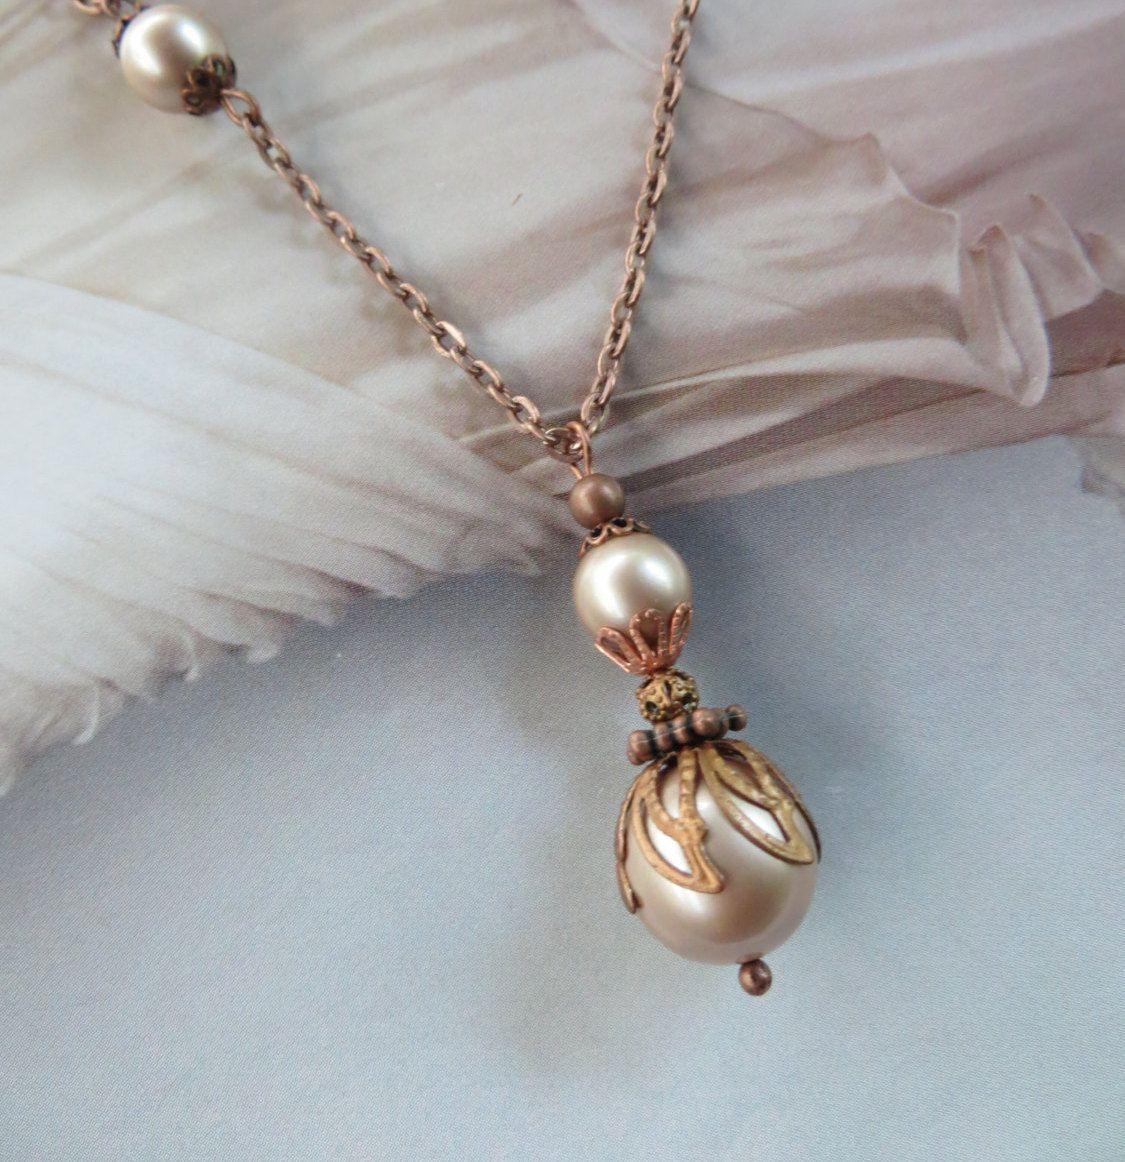 Vintage Pearl Necklace Copper